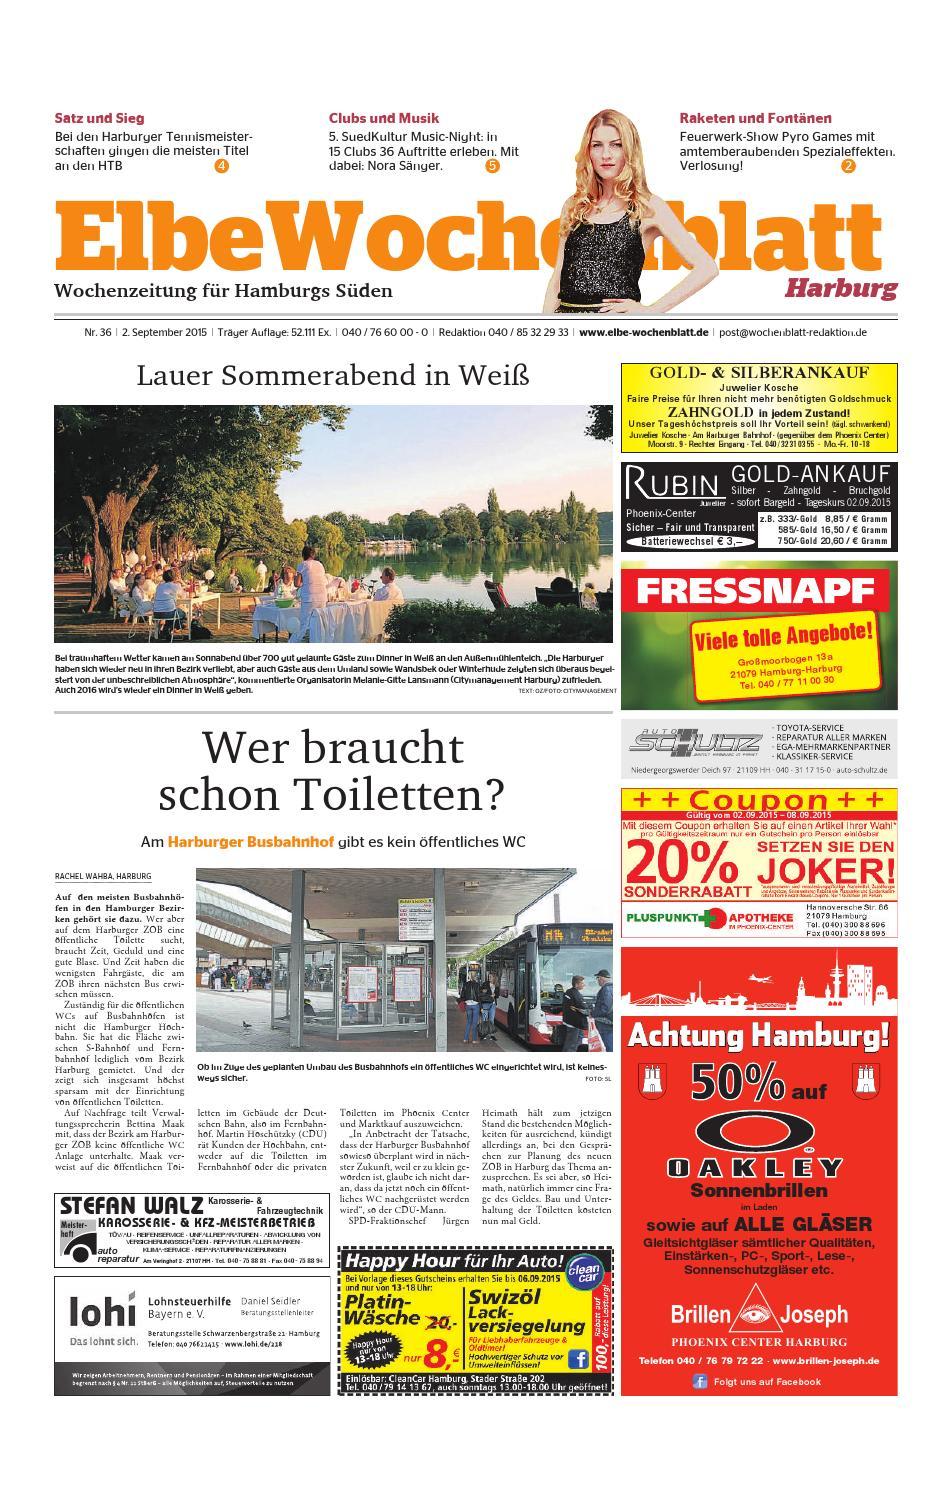 Elbe wochenblatt harburg online dating